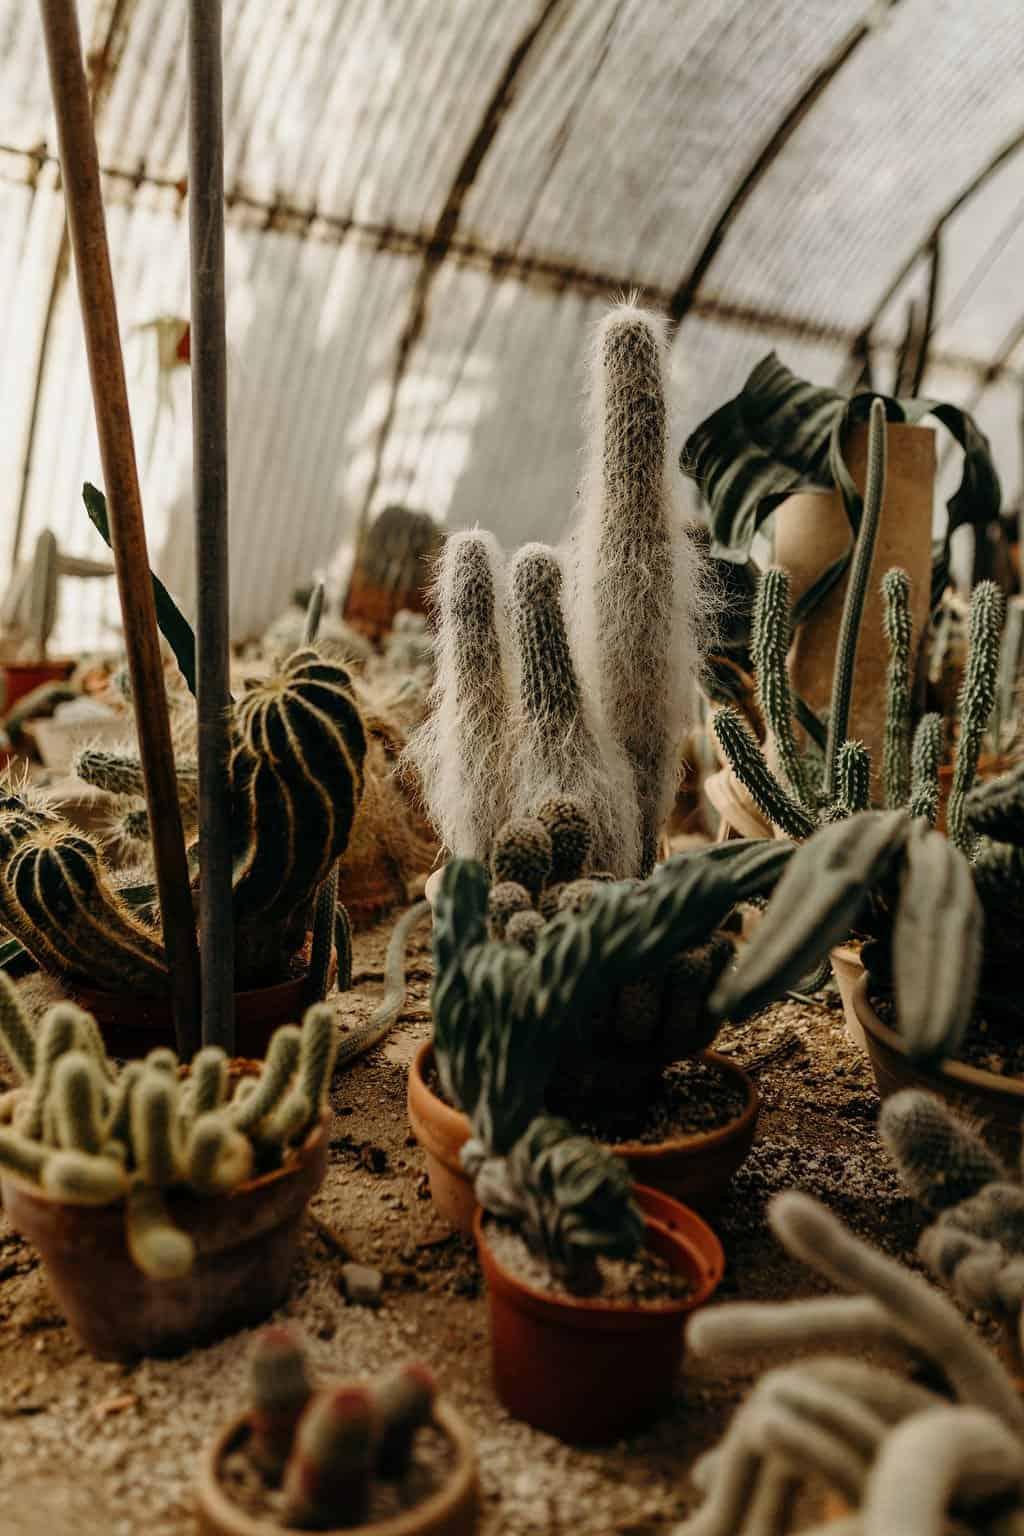 group of cactus in greenhouse at moorten botanical gardens